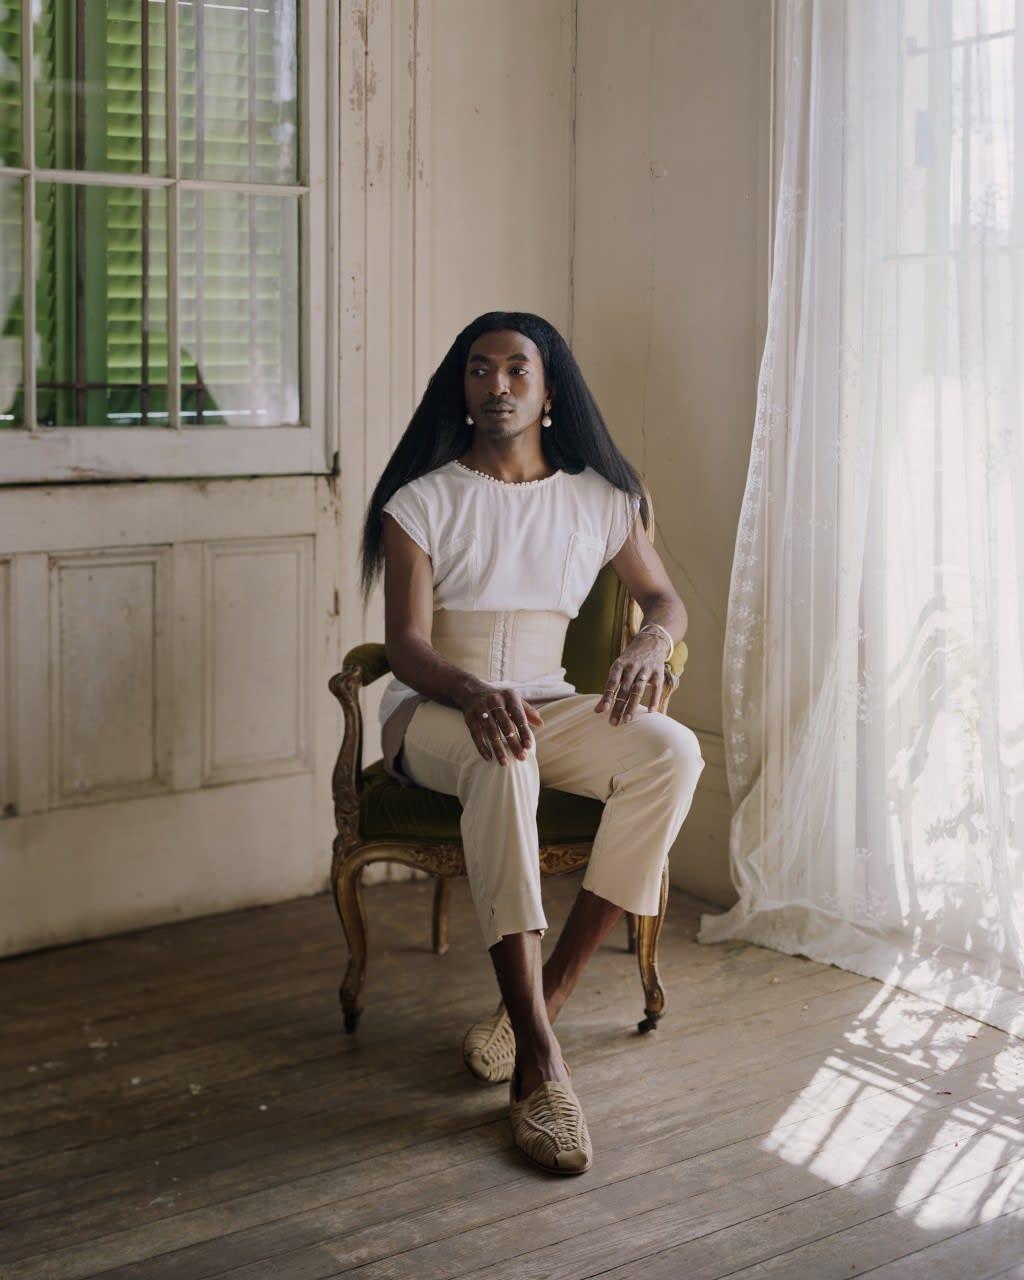 Alec Soth Keni, New Orleans, 2018